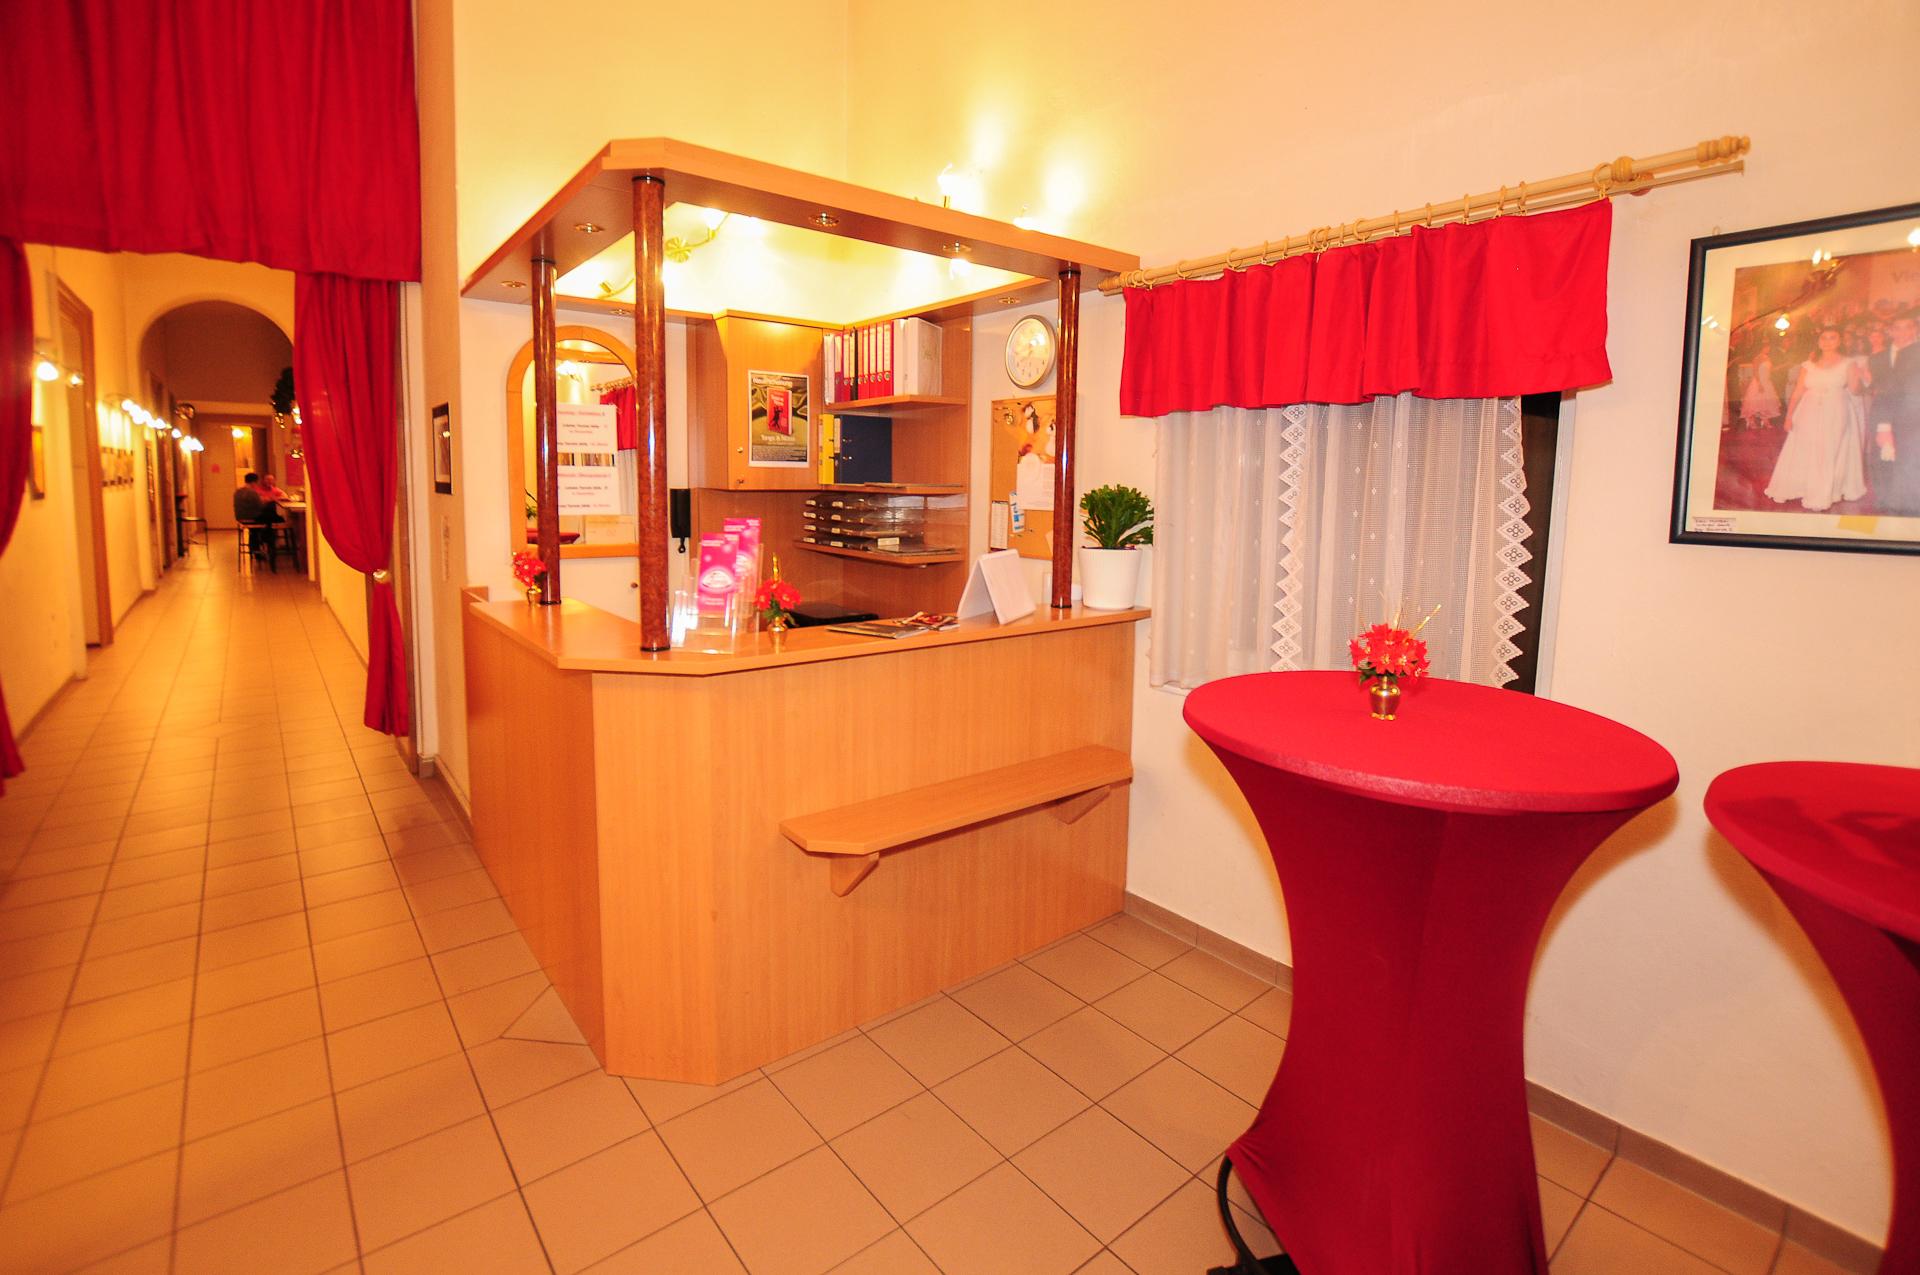 Ball- & Hochzeitskurse - Tanzschule Strobl - Hernals